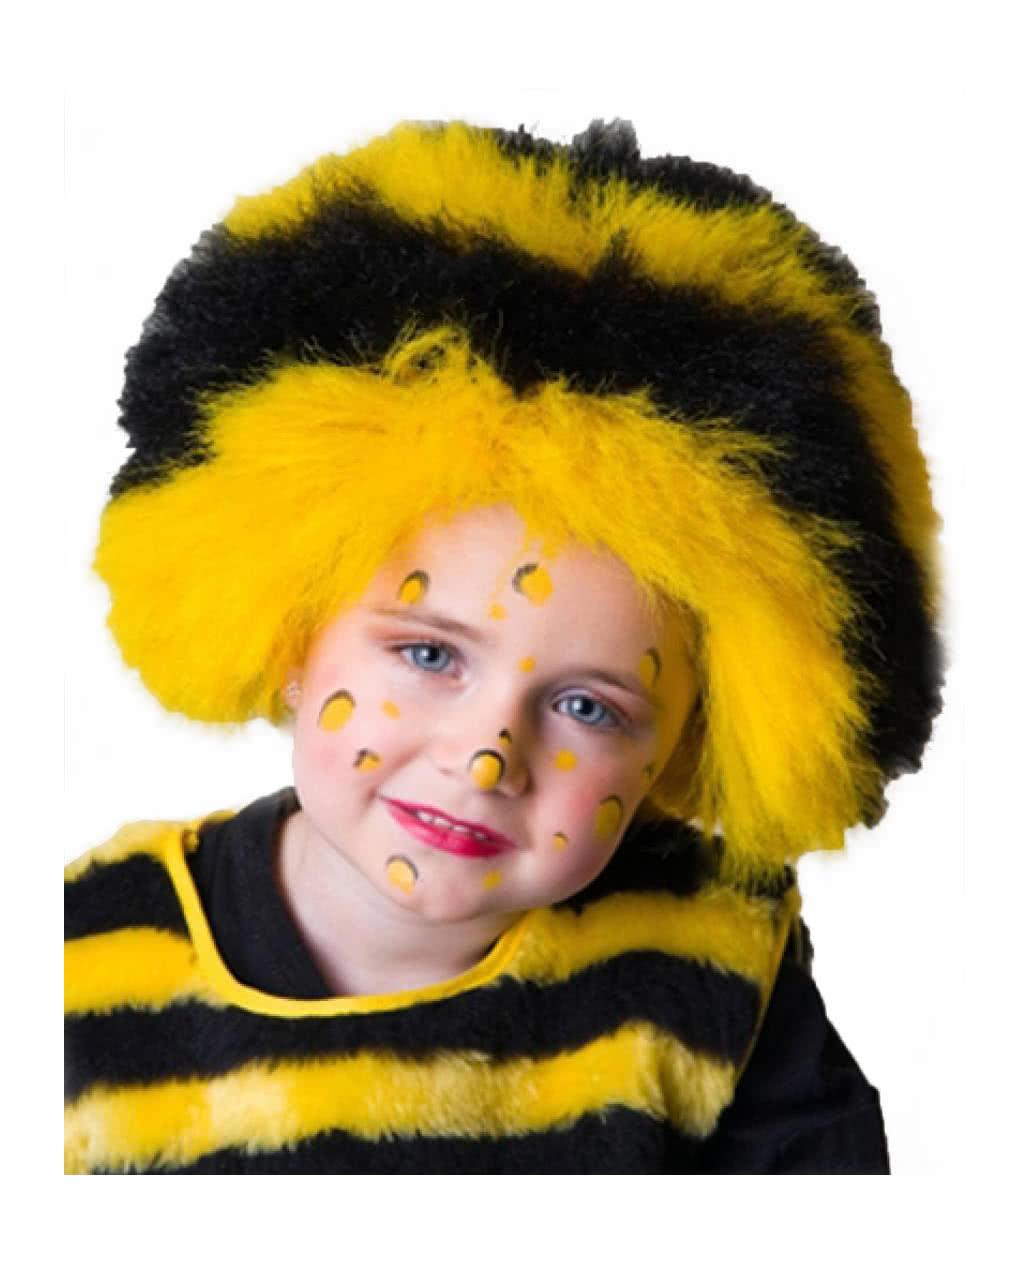 Kinder Bienen Perucke Faschingsperucke Karneval Universe